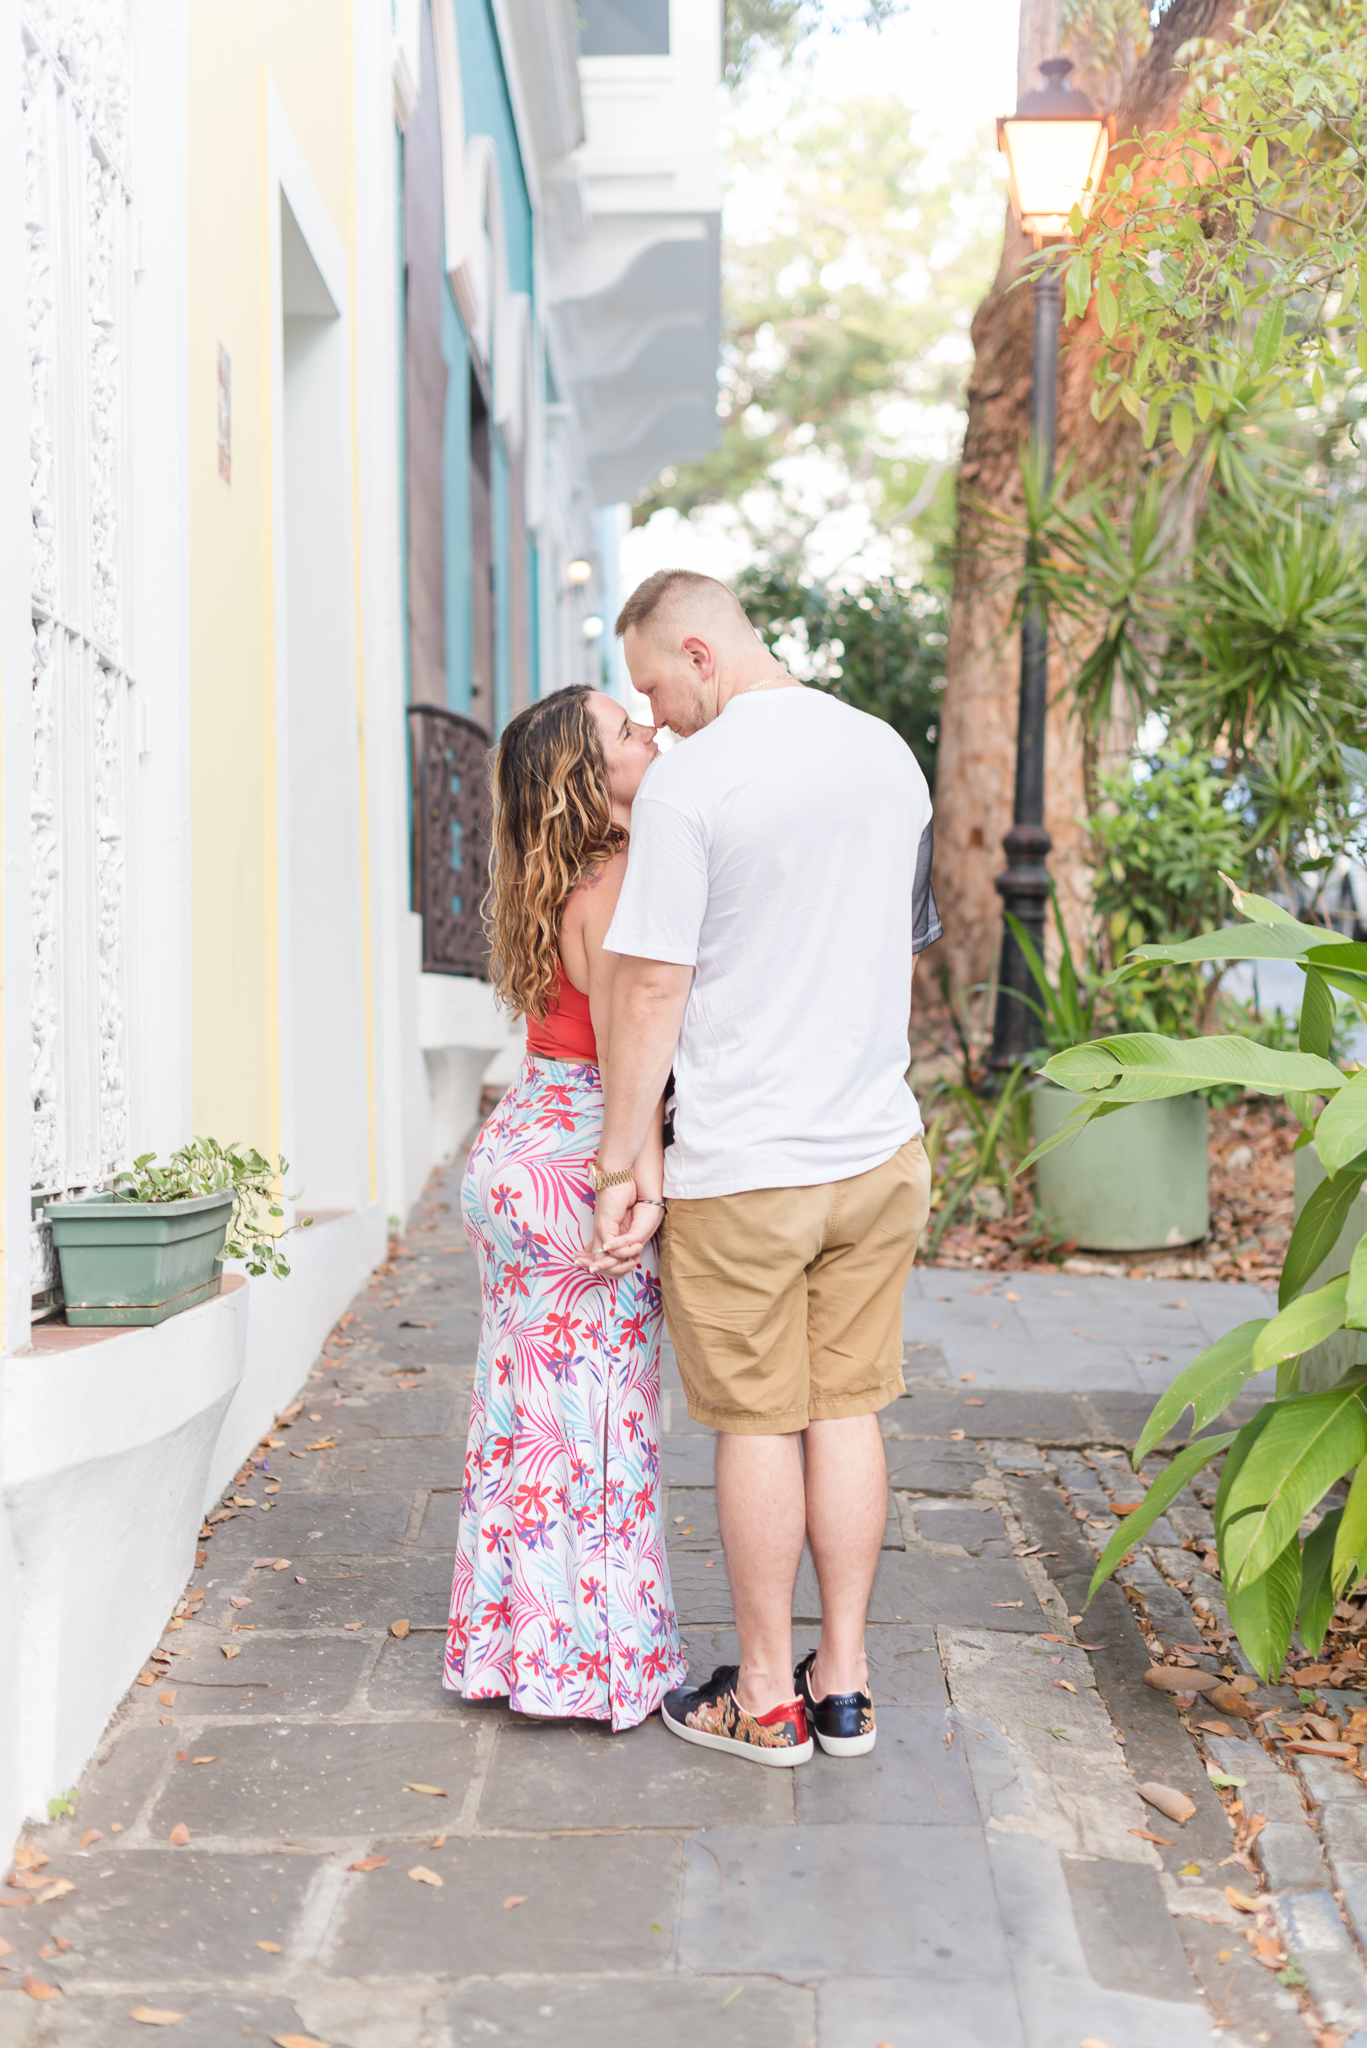 Old San Juan Destination Wedding Photographer-13.jpg